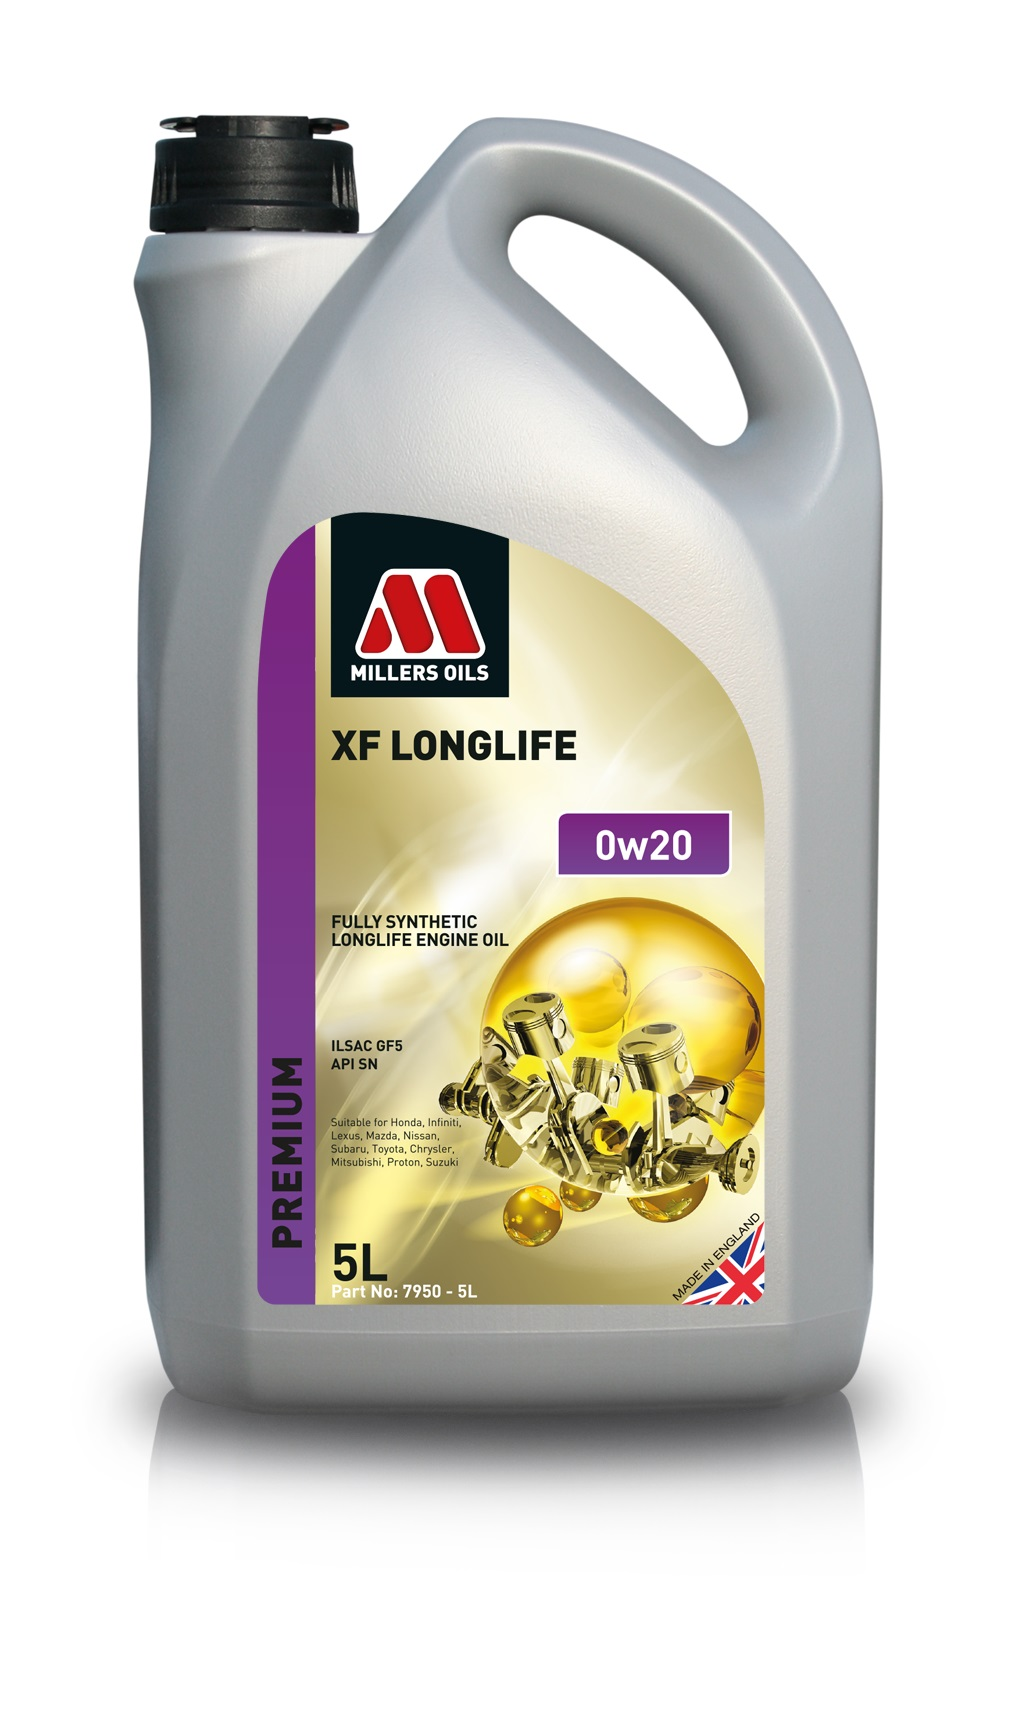 xf-longlife-0w20_5l